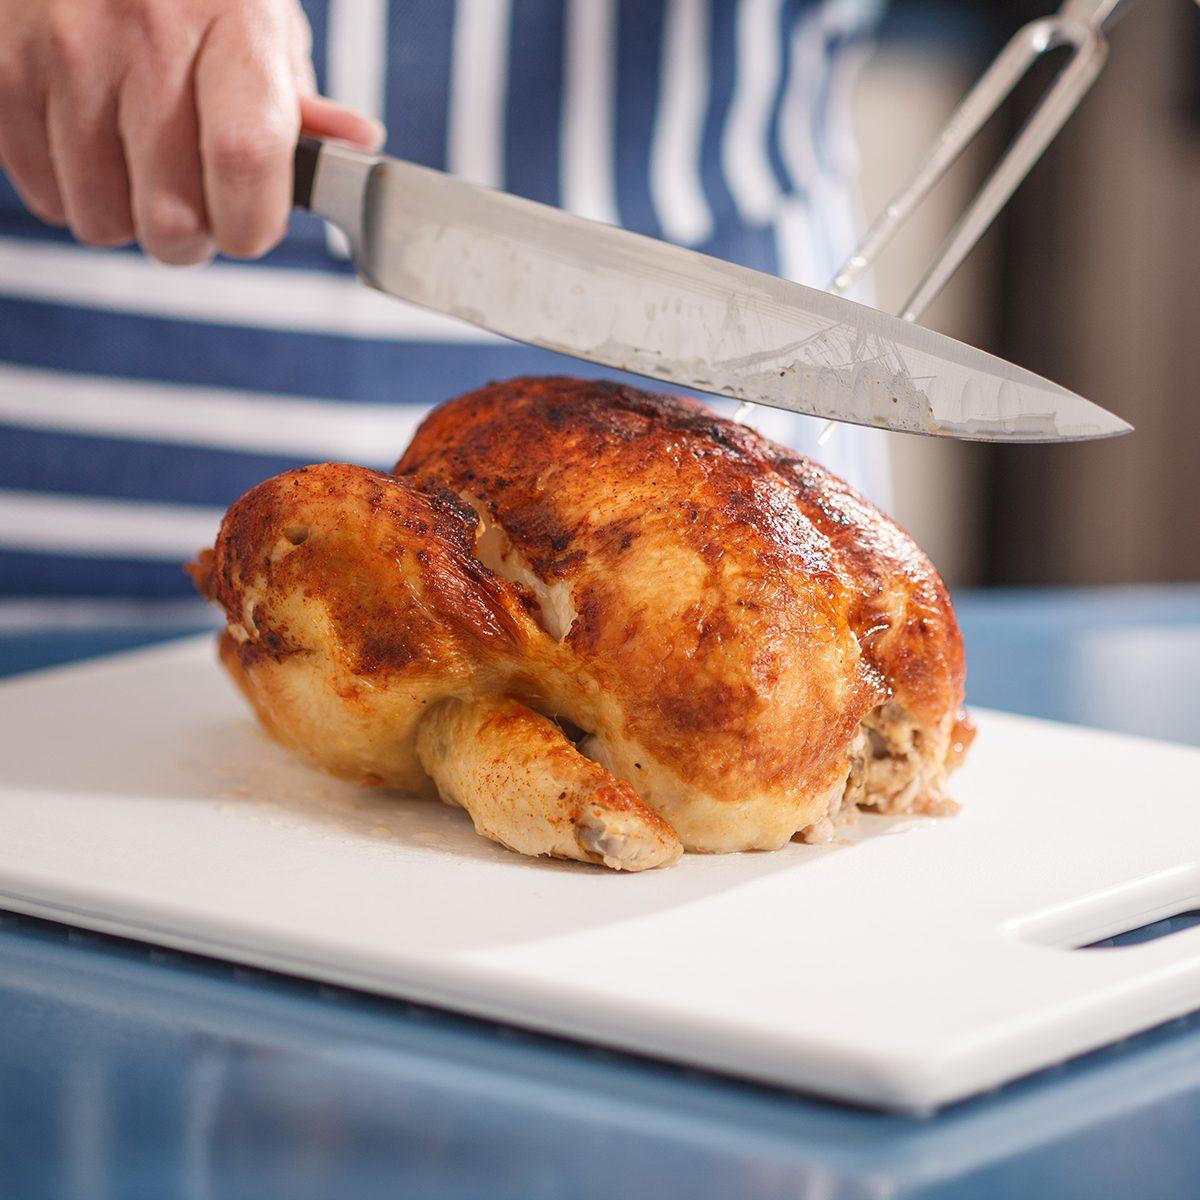 Slicing Chicken on cutting board